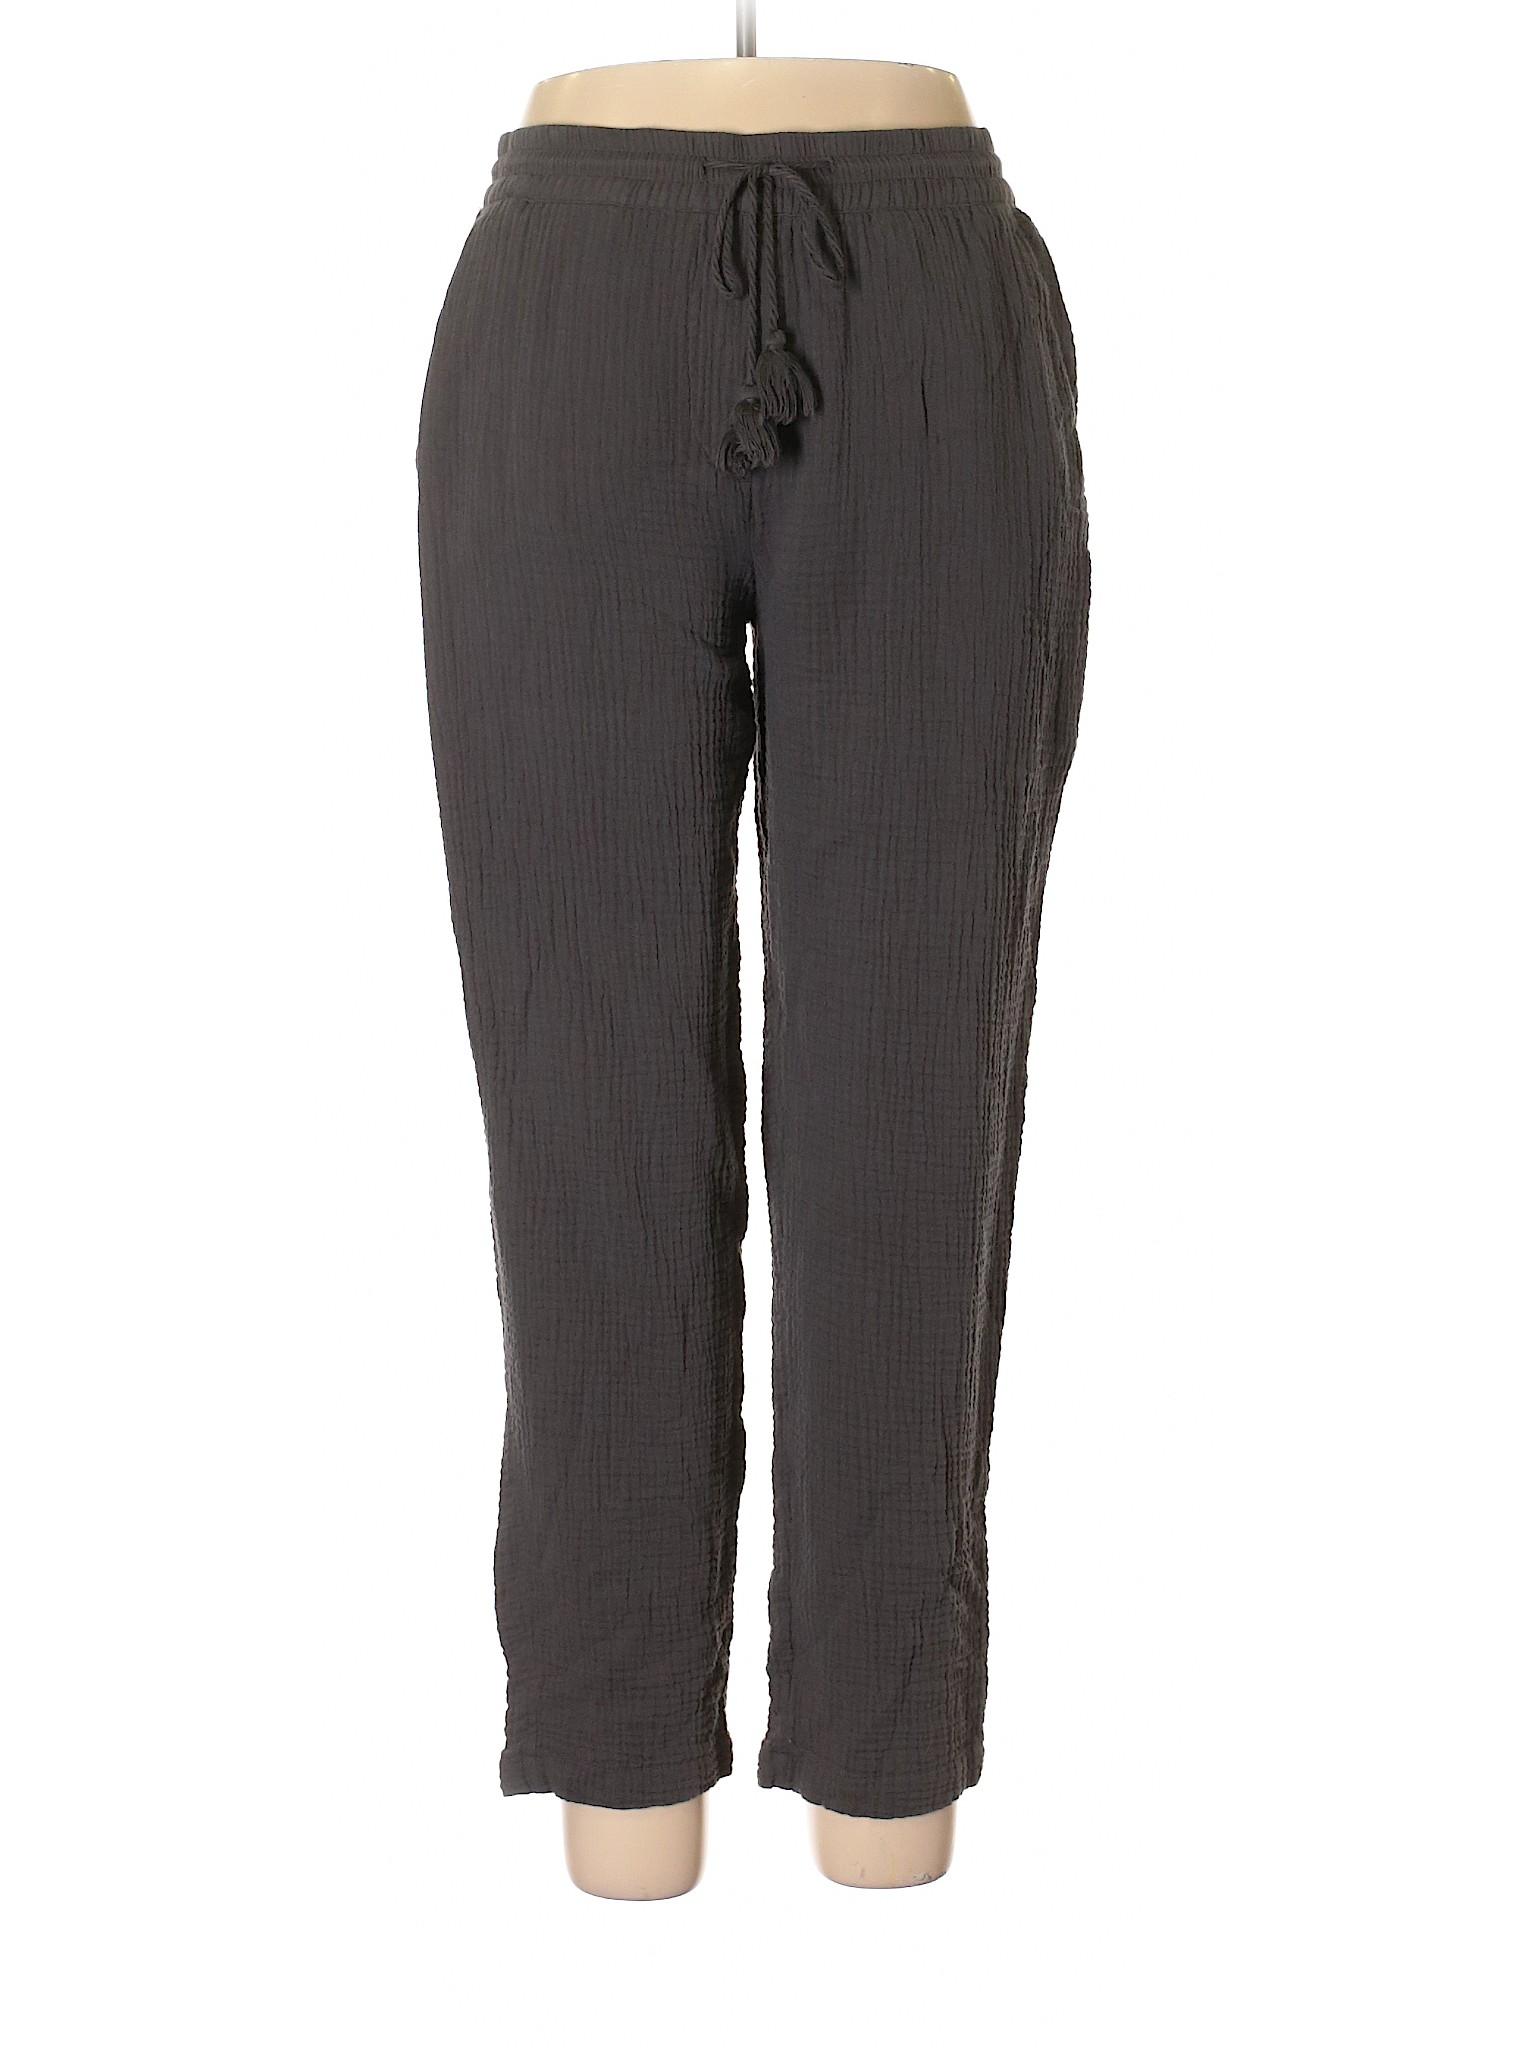 Rowley J winter Cynthia for T Casual Leisure Pants Maxx qXE7Owx